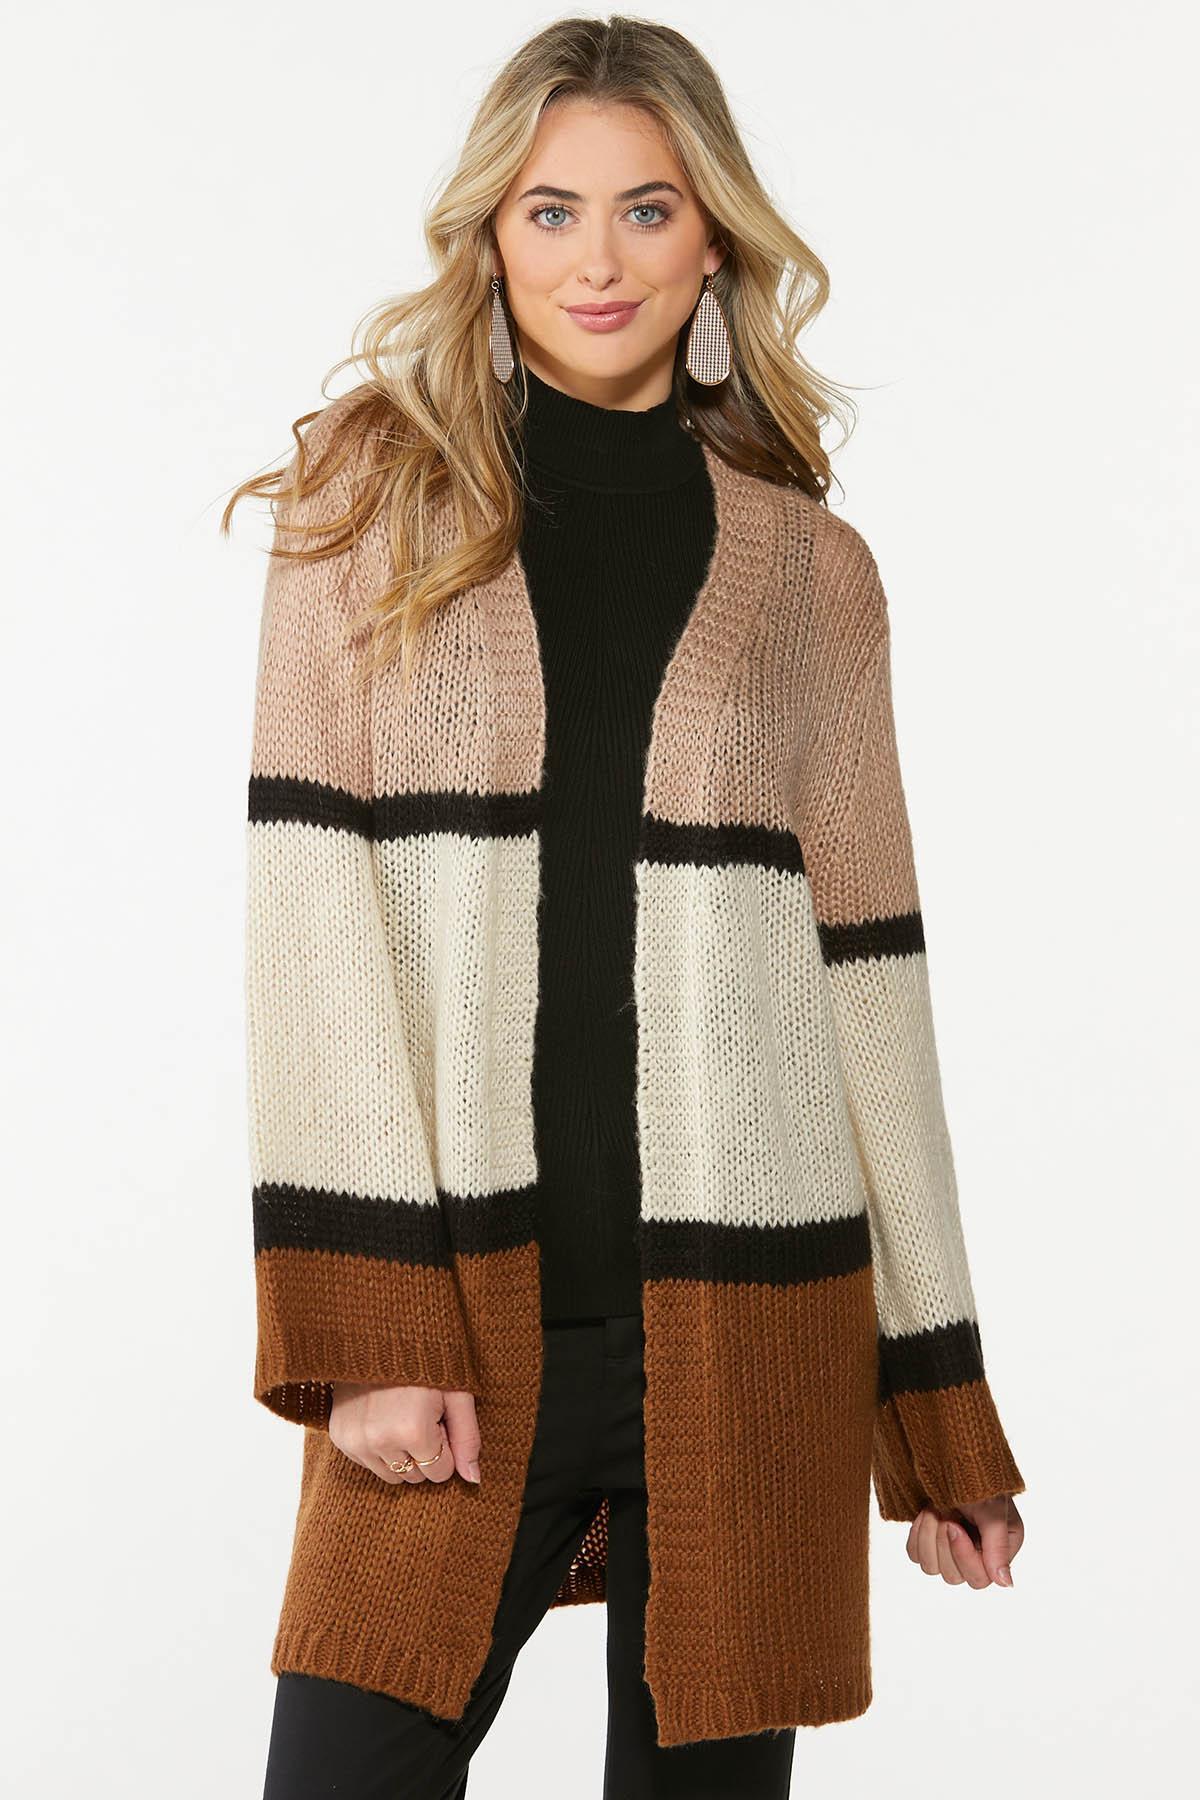 Caramel Cream Cardigan Sweater